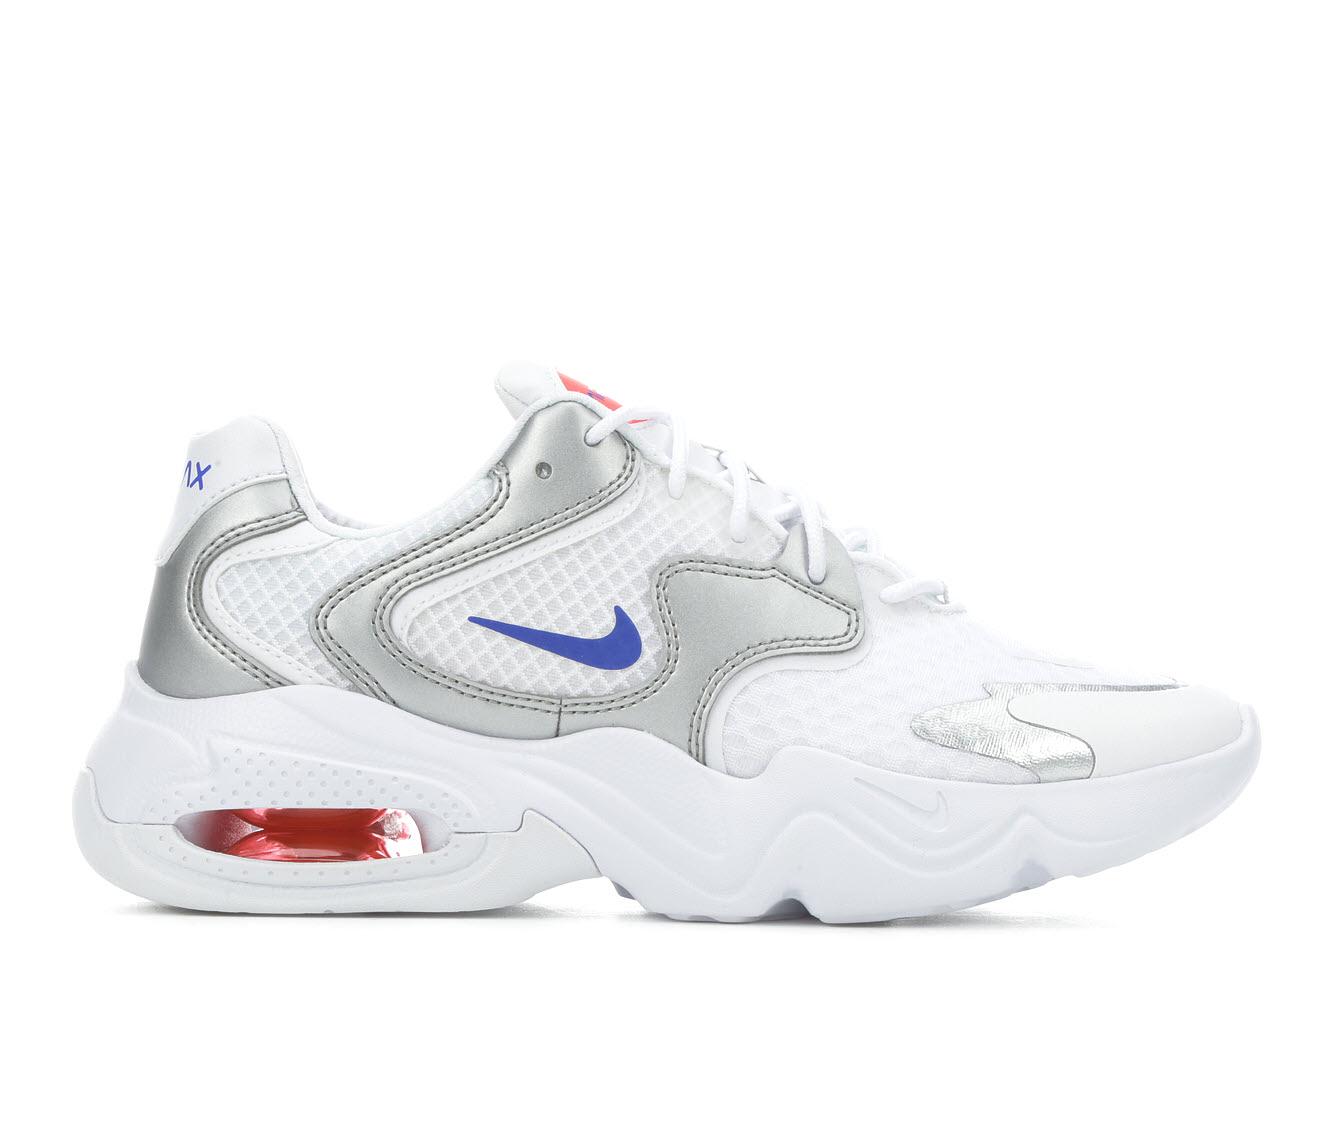 Nike Air Max 2X Women's Athletic Shoe